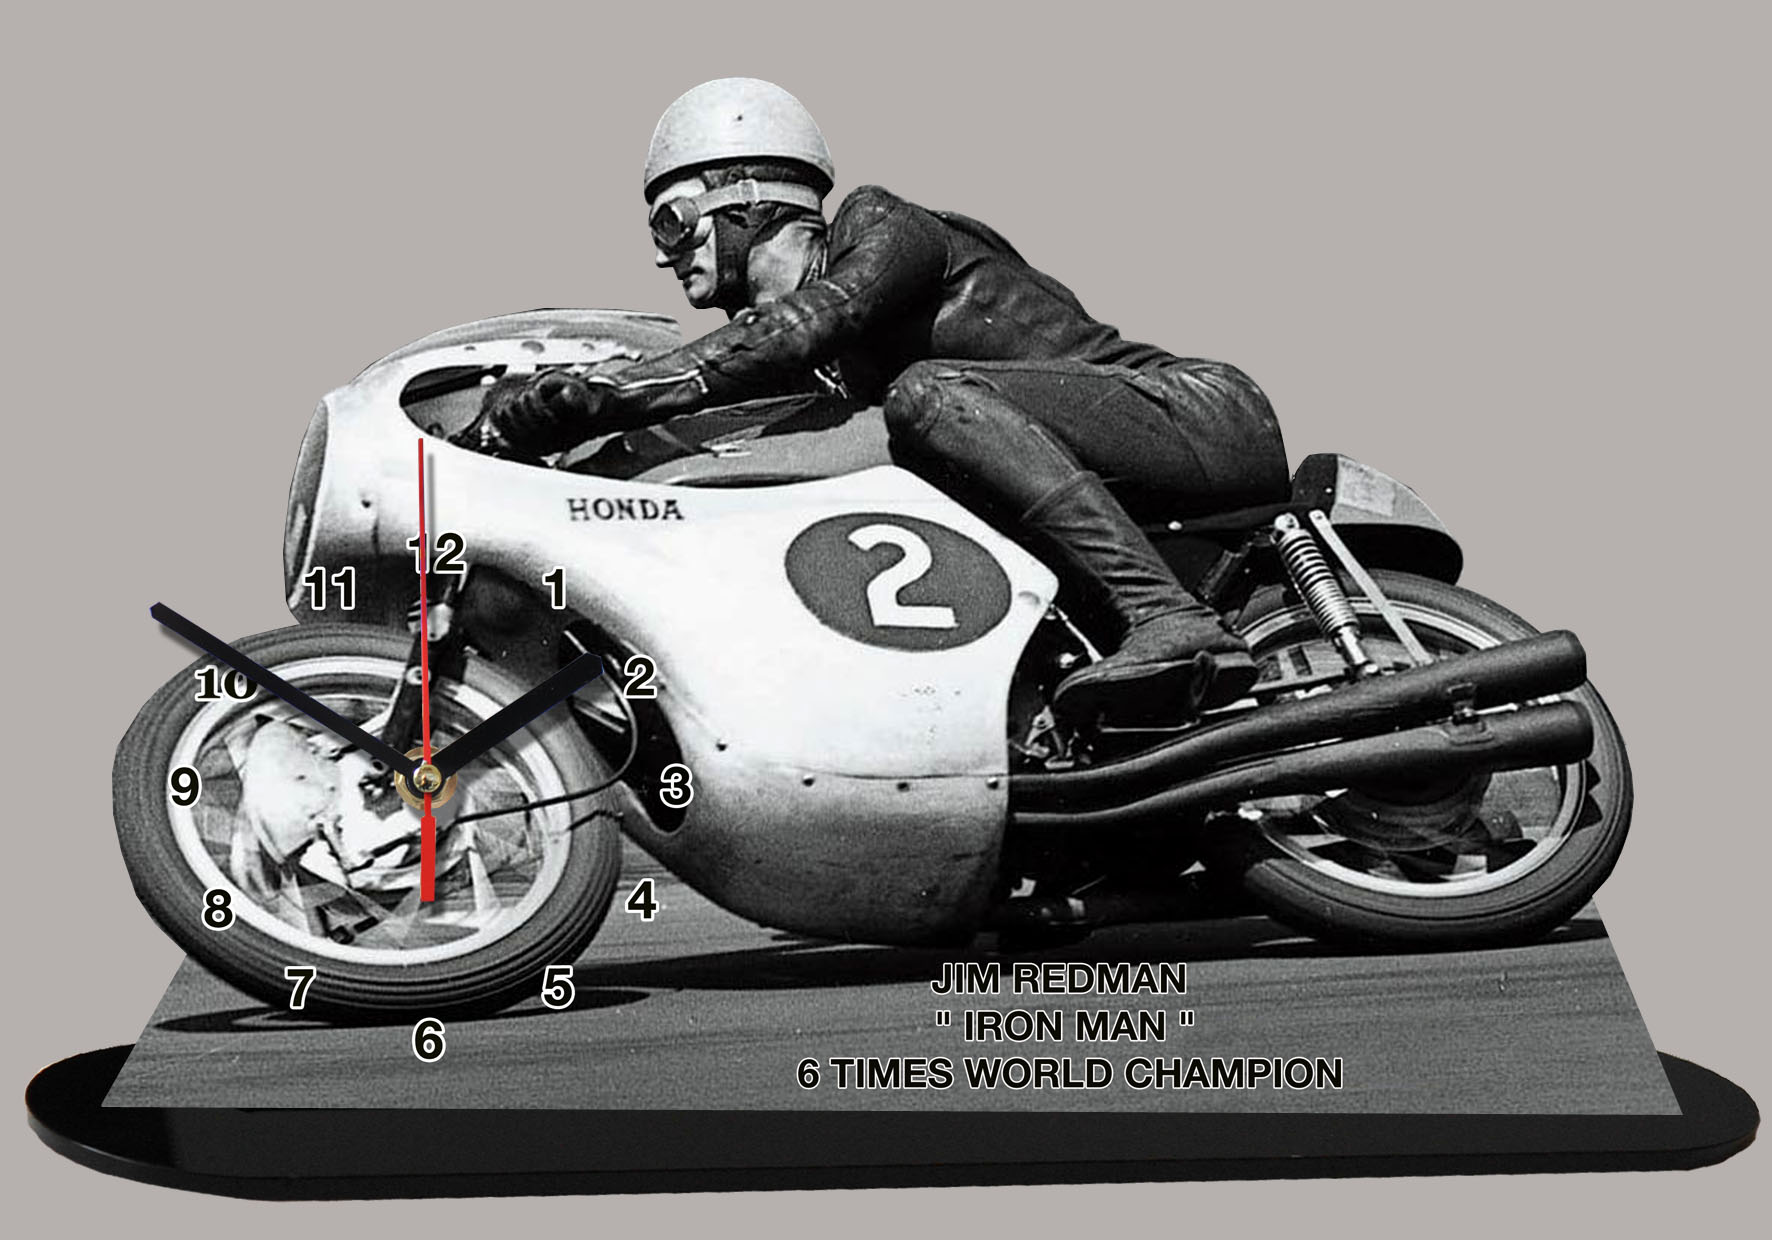 james arthur jim redman pilote moto en miniature moto horloge. Black Bedroom Furniture Sets. Home Design Ideas